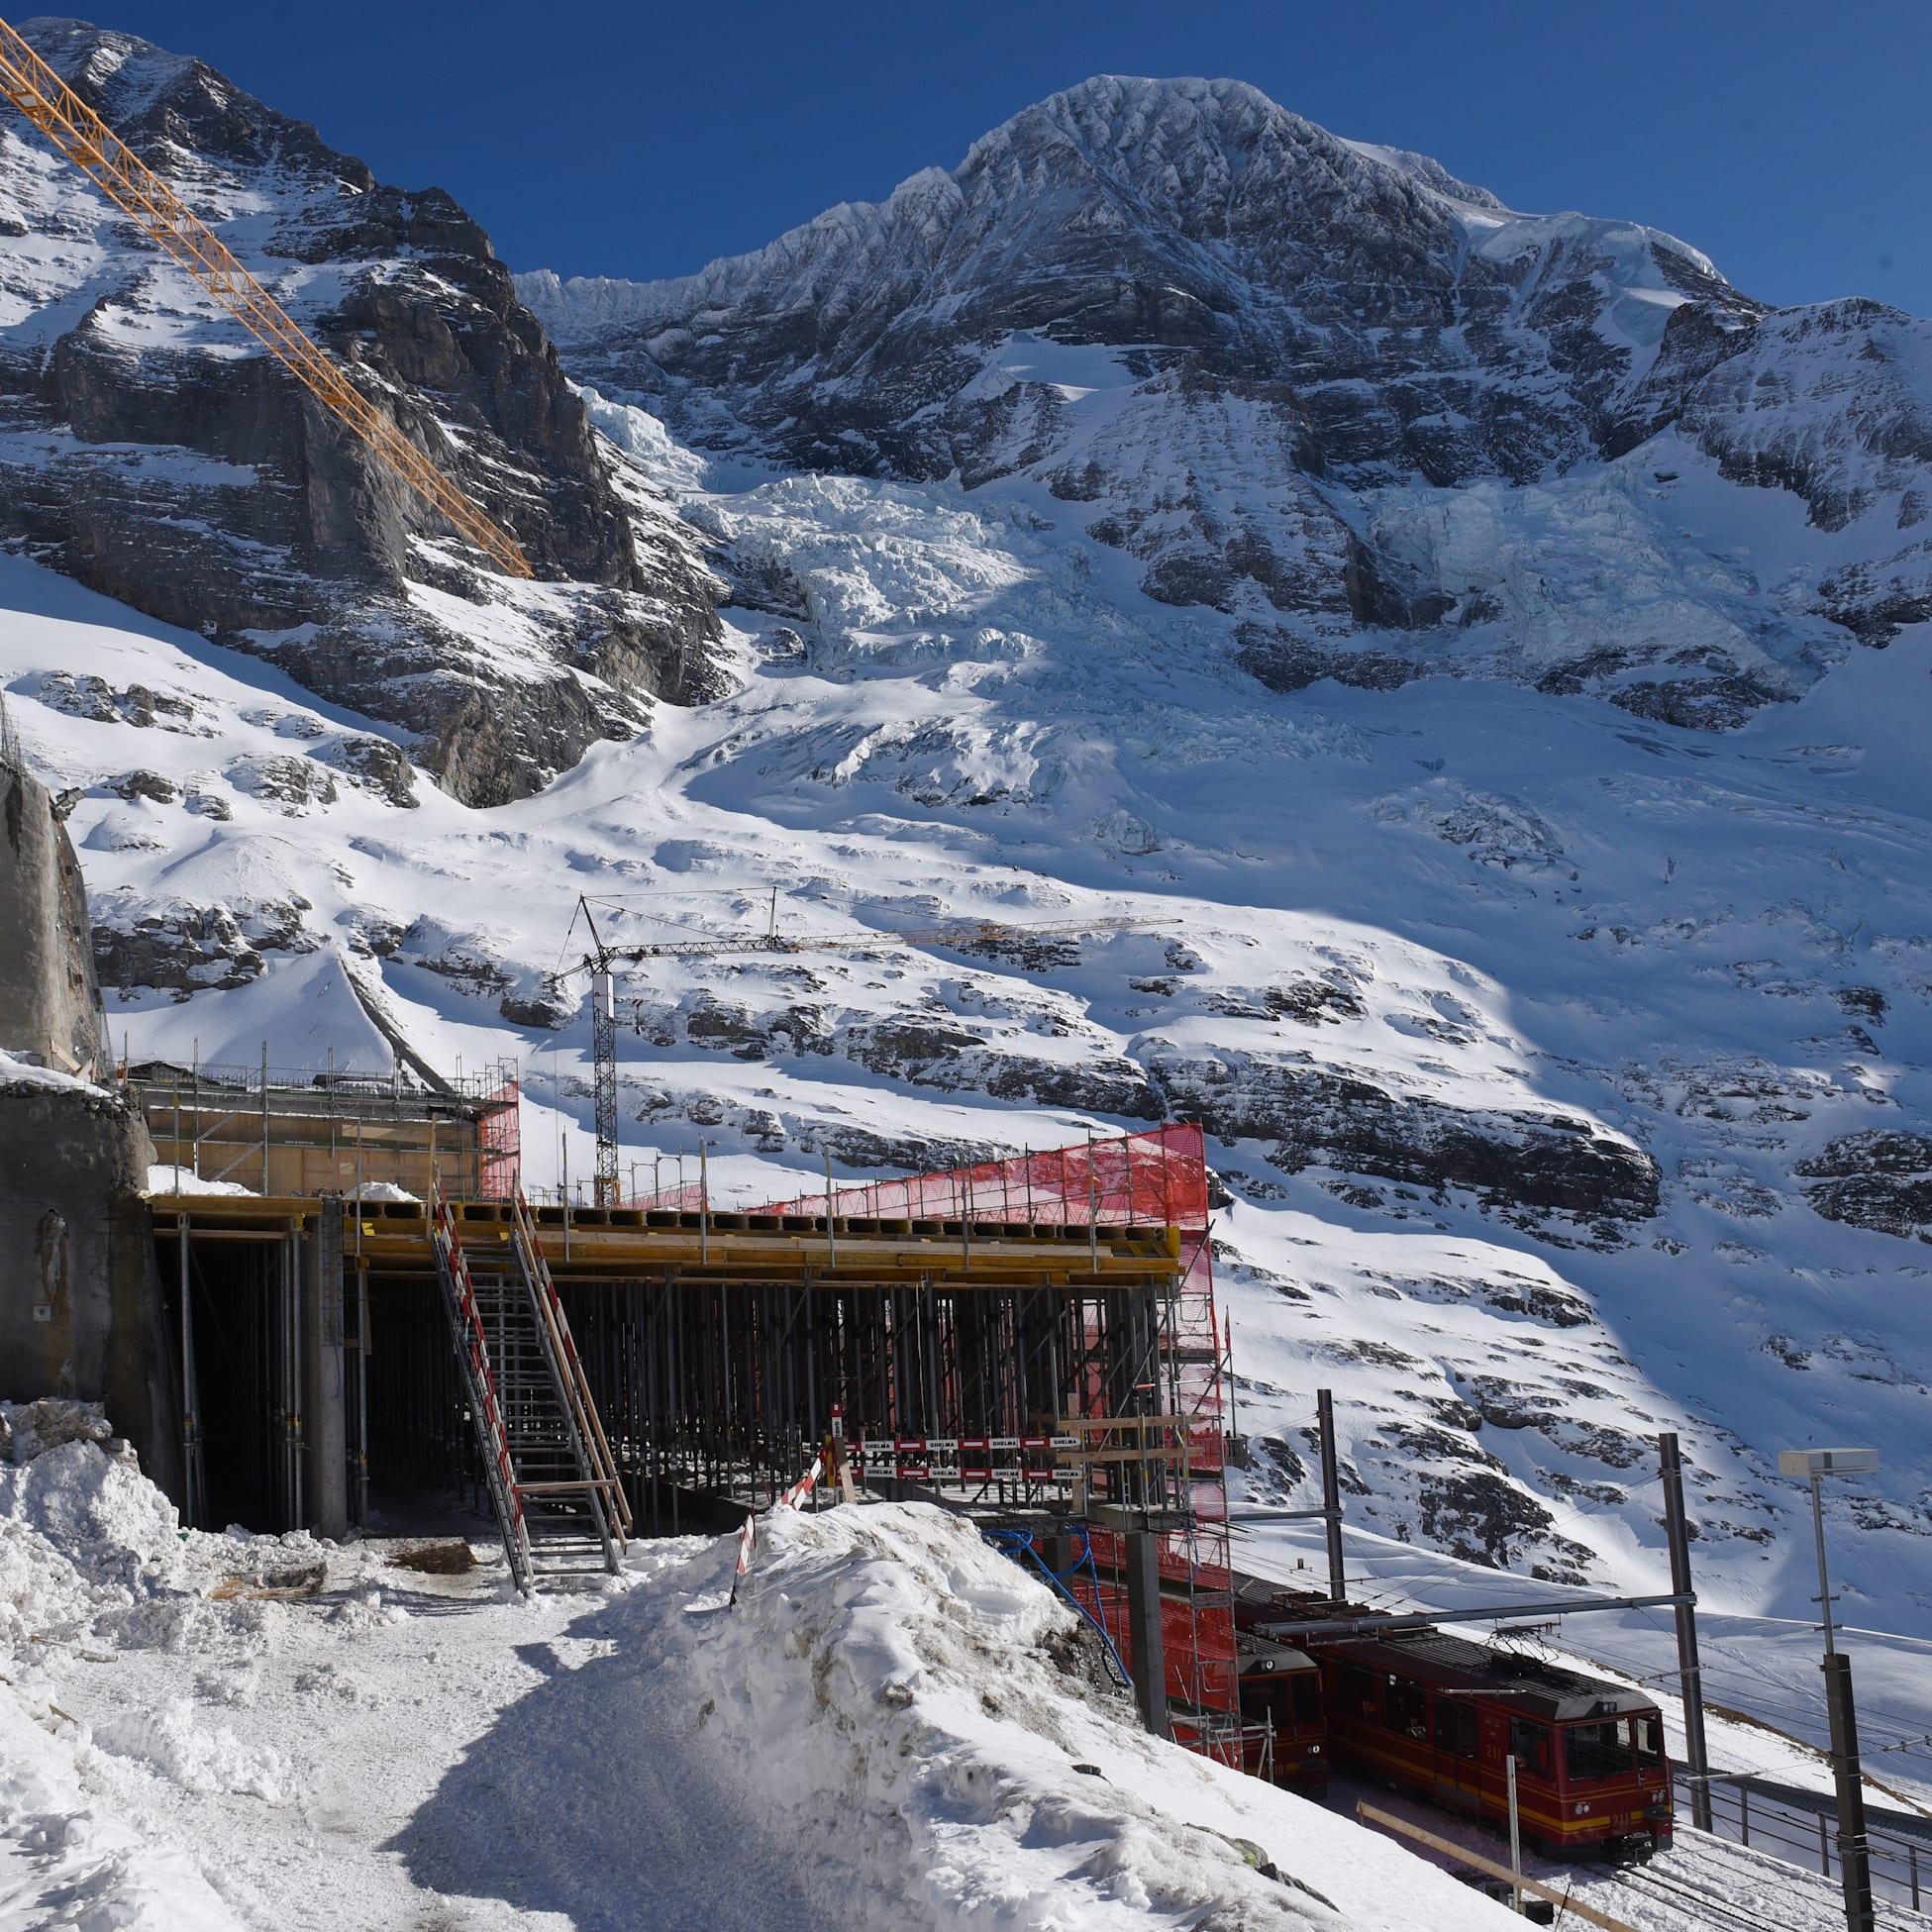 Eiger Glacier railway station construction site February 2020